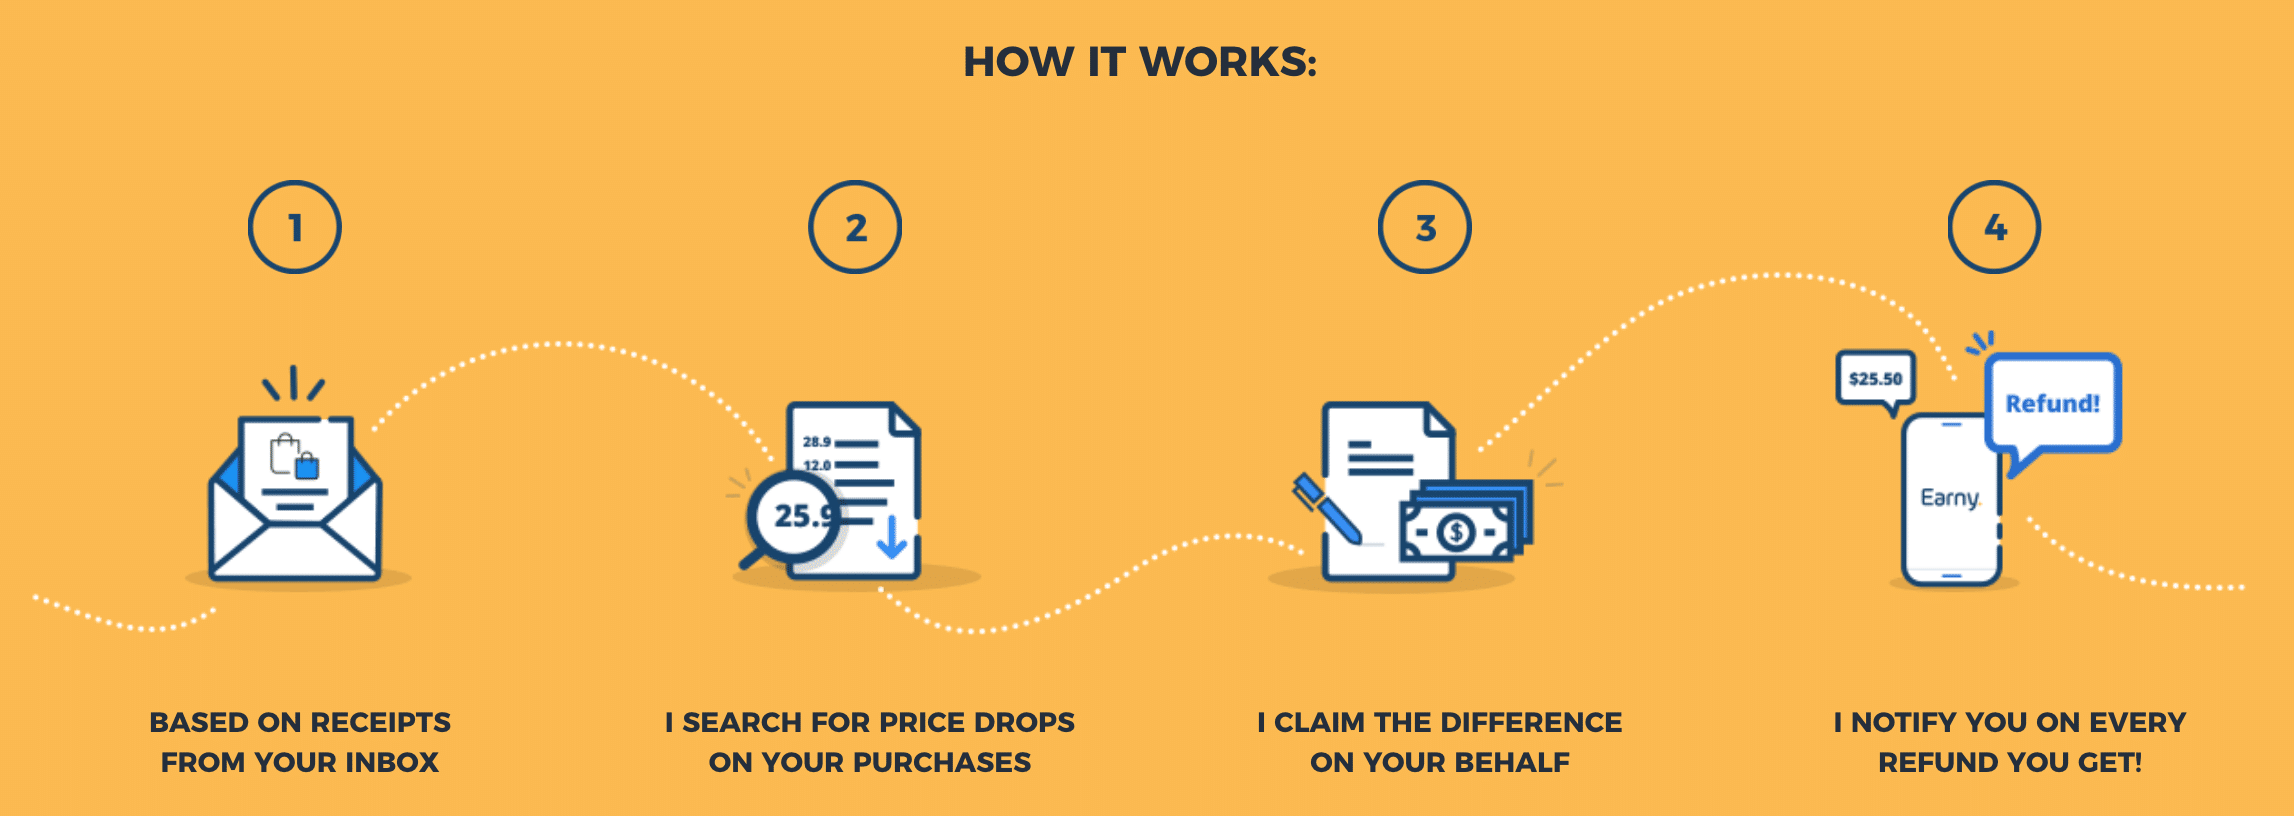 Making Money Online Article Image 16